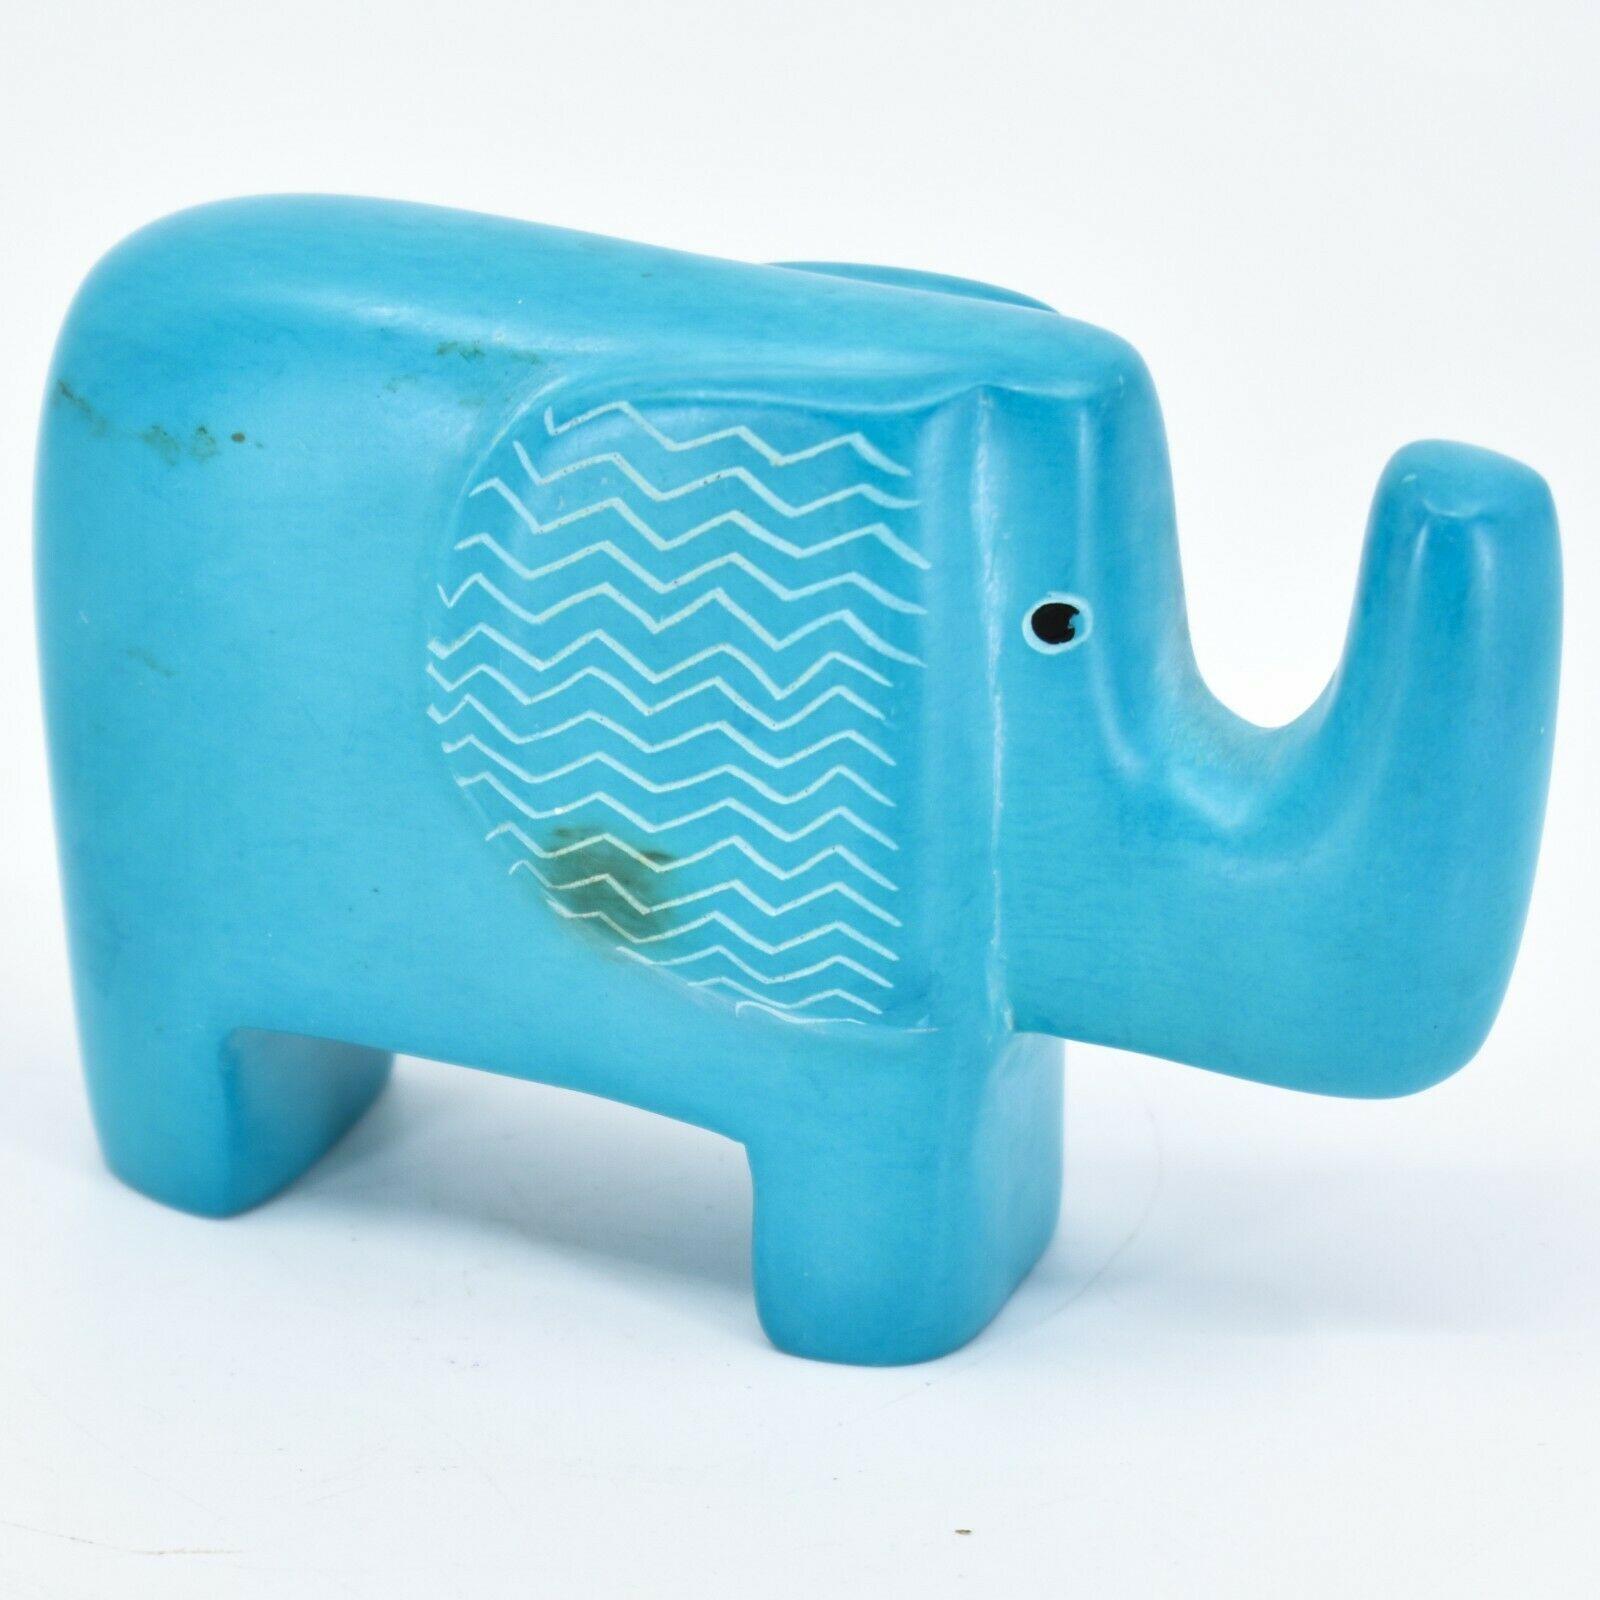 Hand Carved Kisii Soapstone Aqua Sky Blue Bashful Elephant Figure Made in Kenya